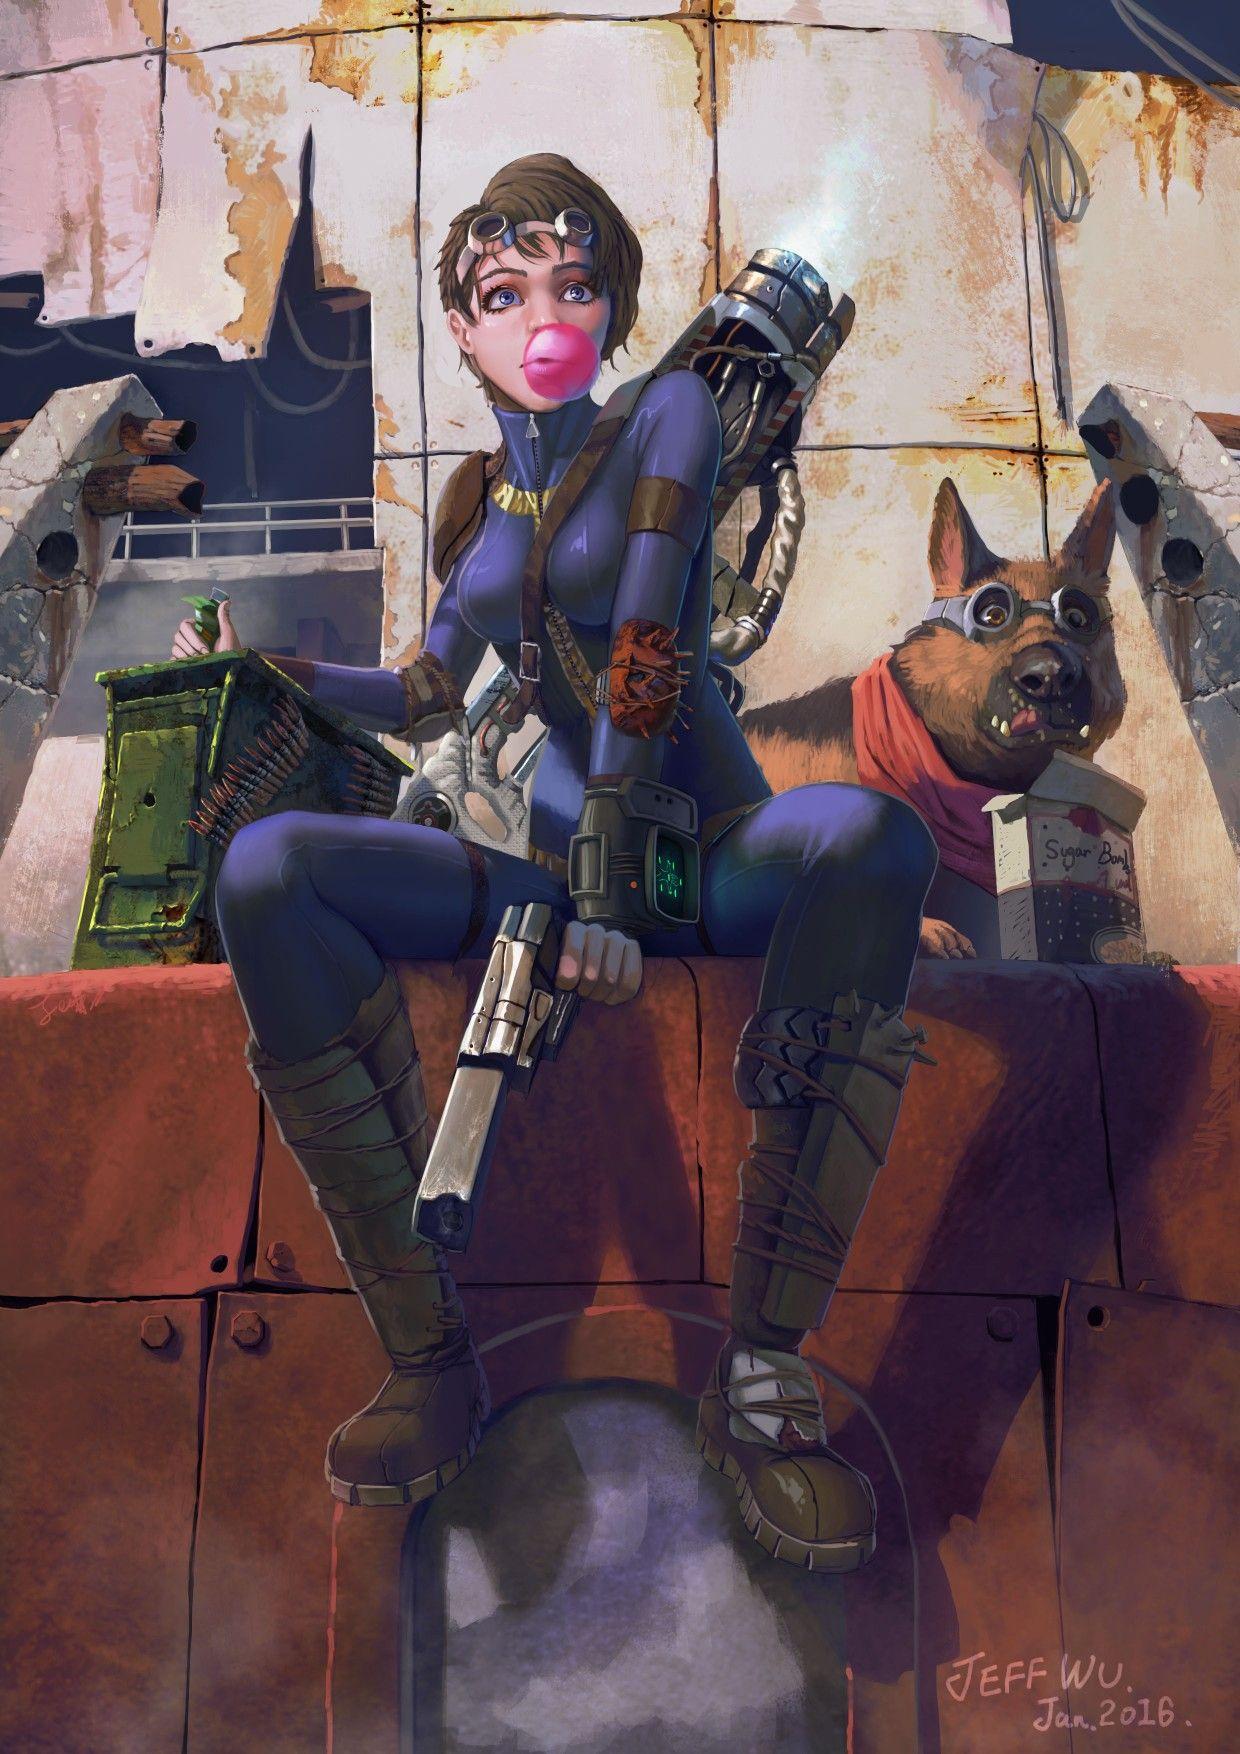 Tela Vasir Armor for Fallout 4 by Shiala92 on DeviantArt